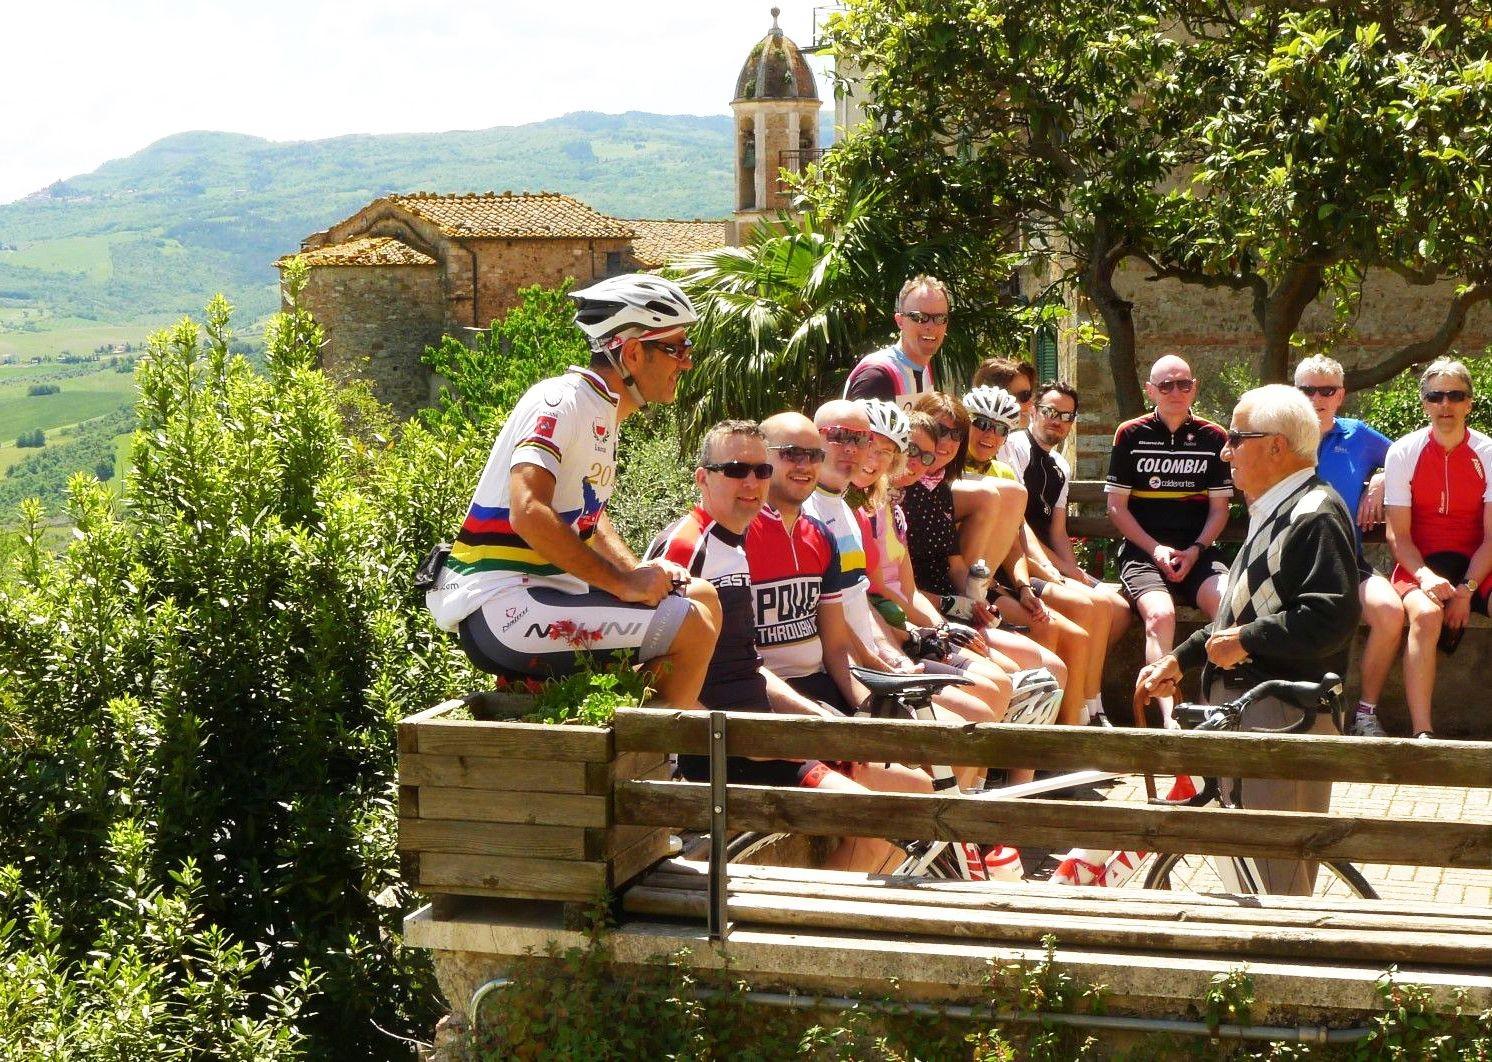 guided-group-cycling-holiday-tuscany-italy.jpg - Italy - Tuscany Tourer - Guided Road Cycling Holiday - Road Cycling